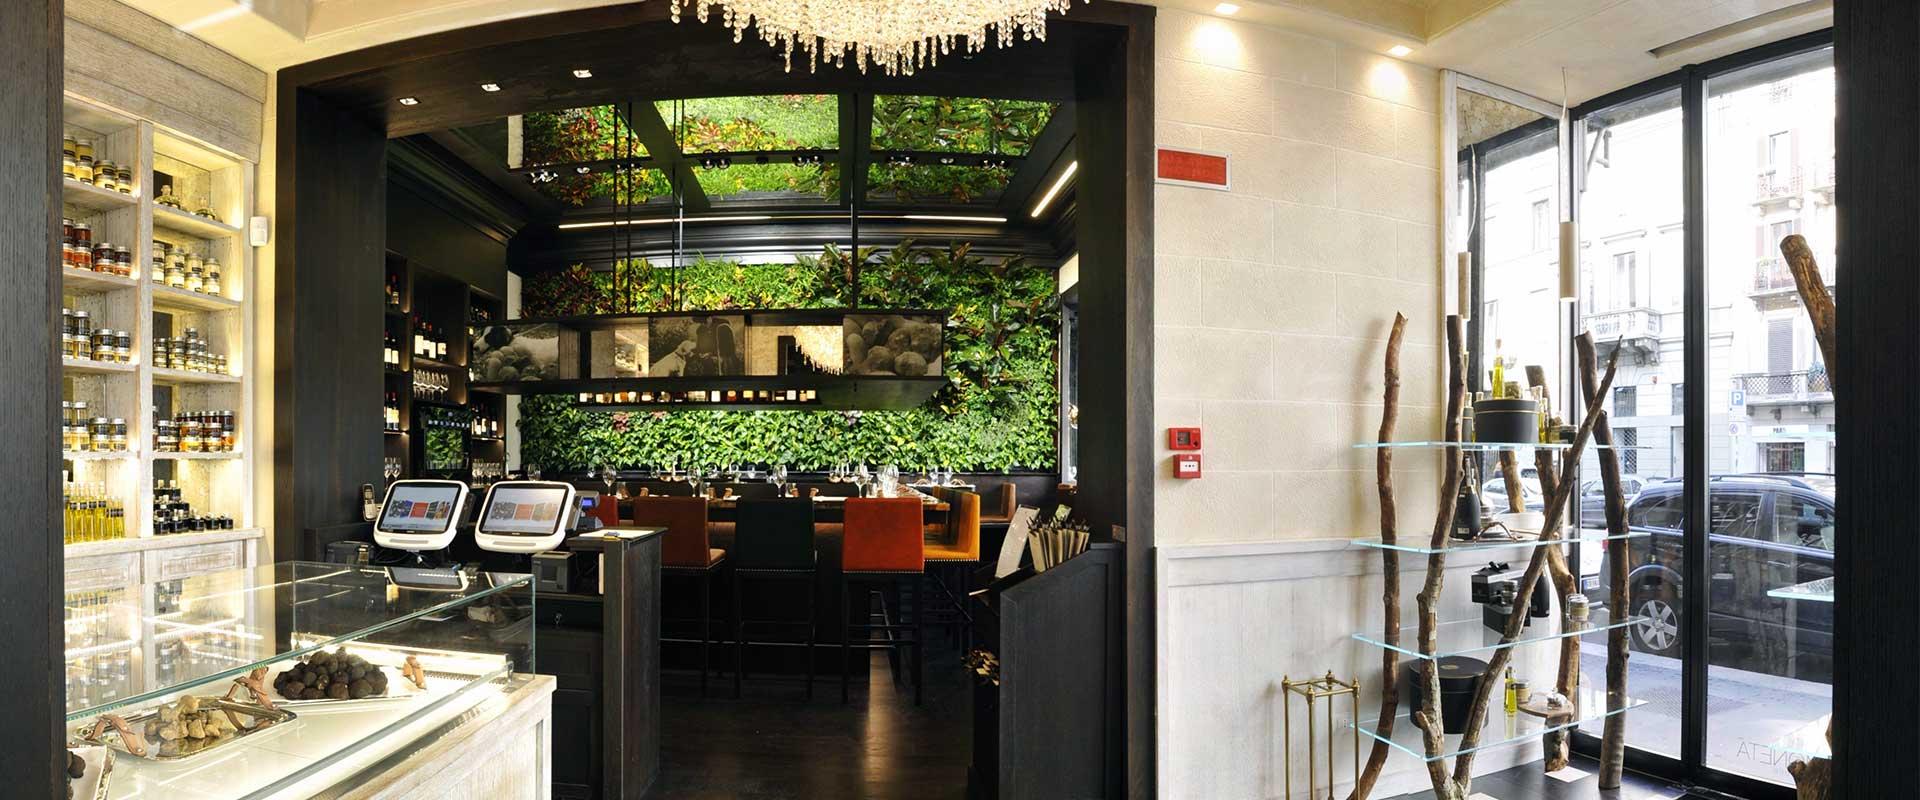 tartufi-milano-ristorante-4